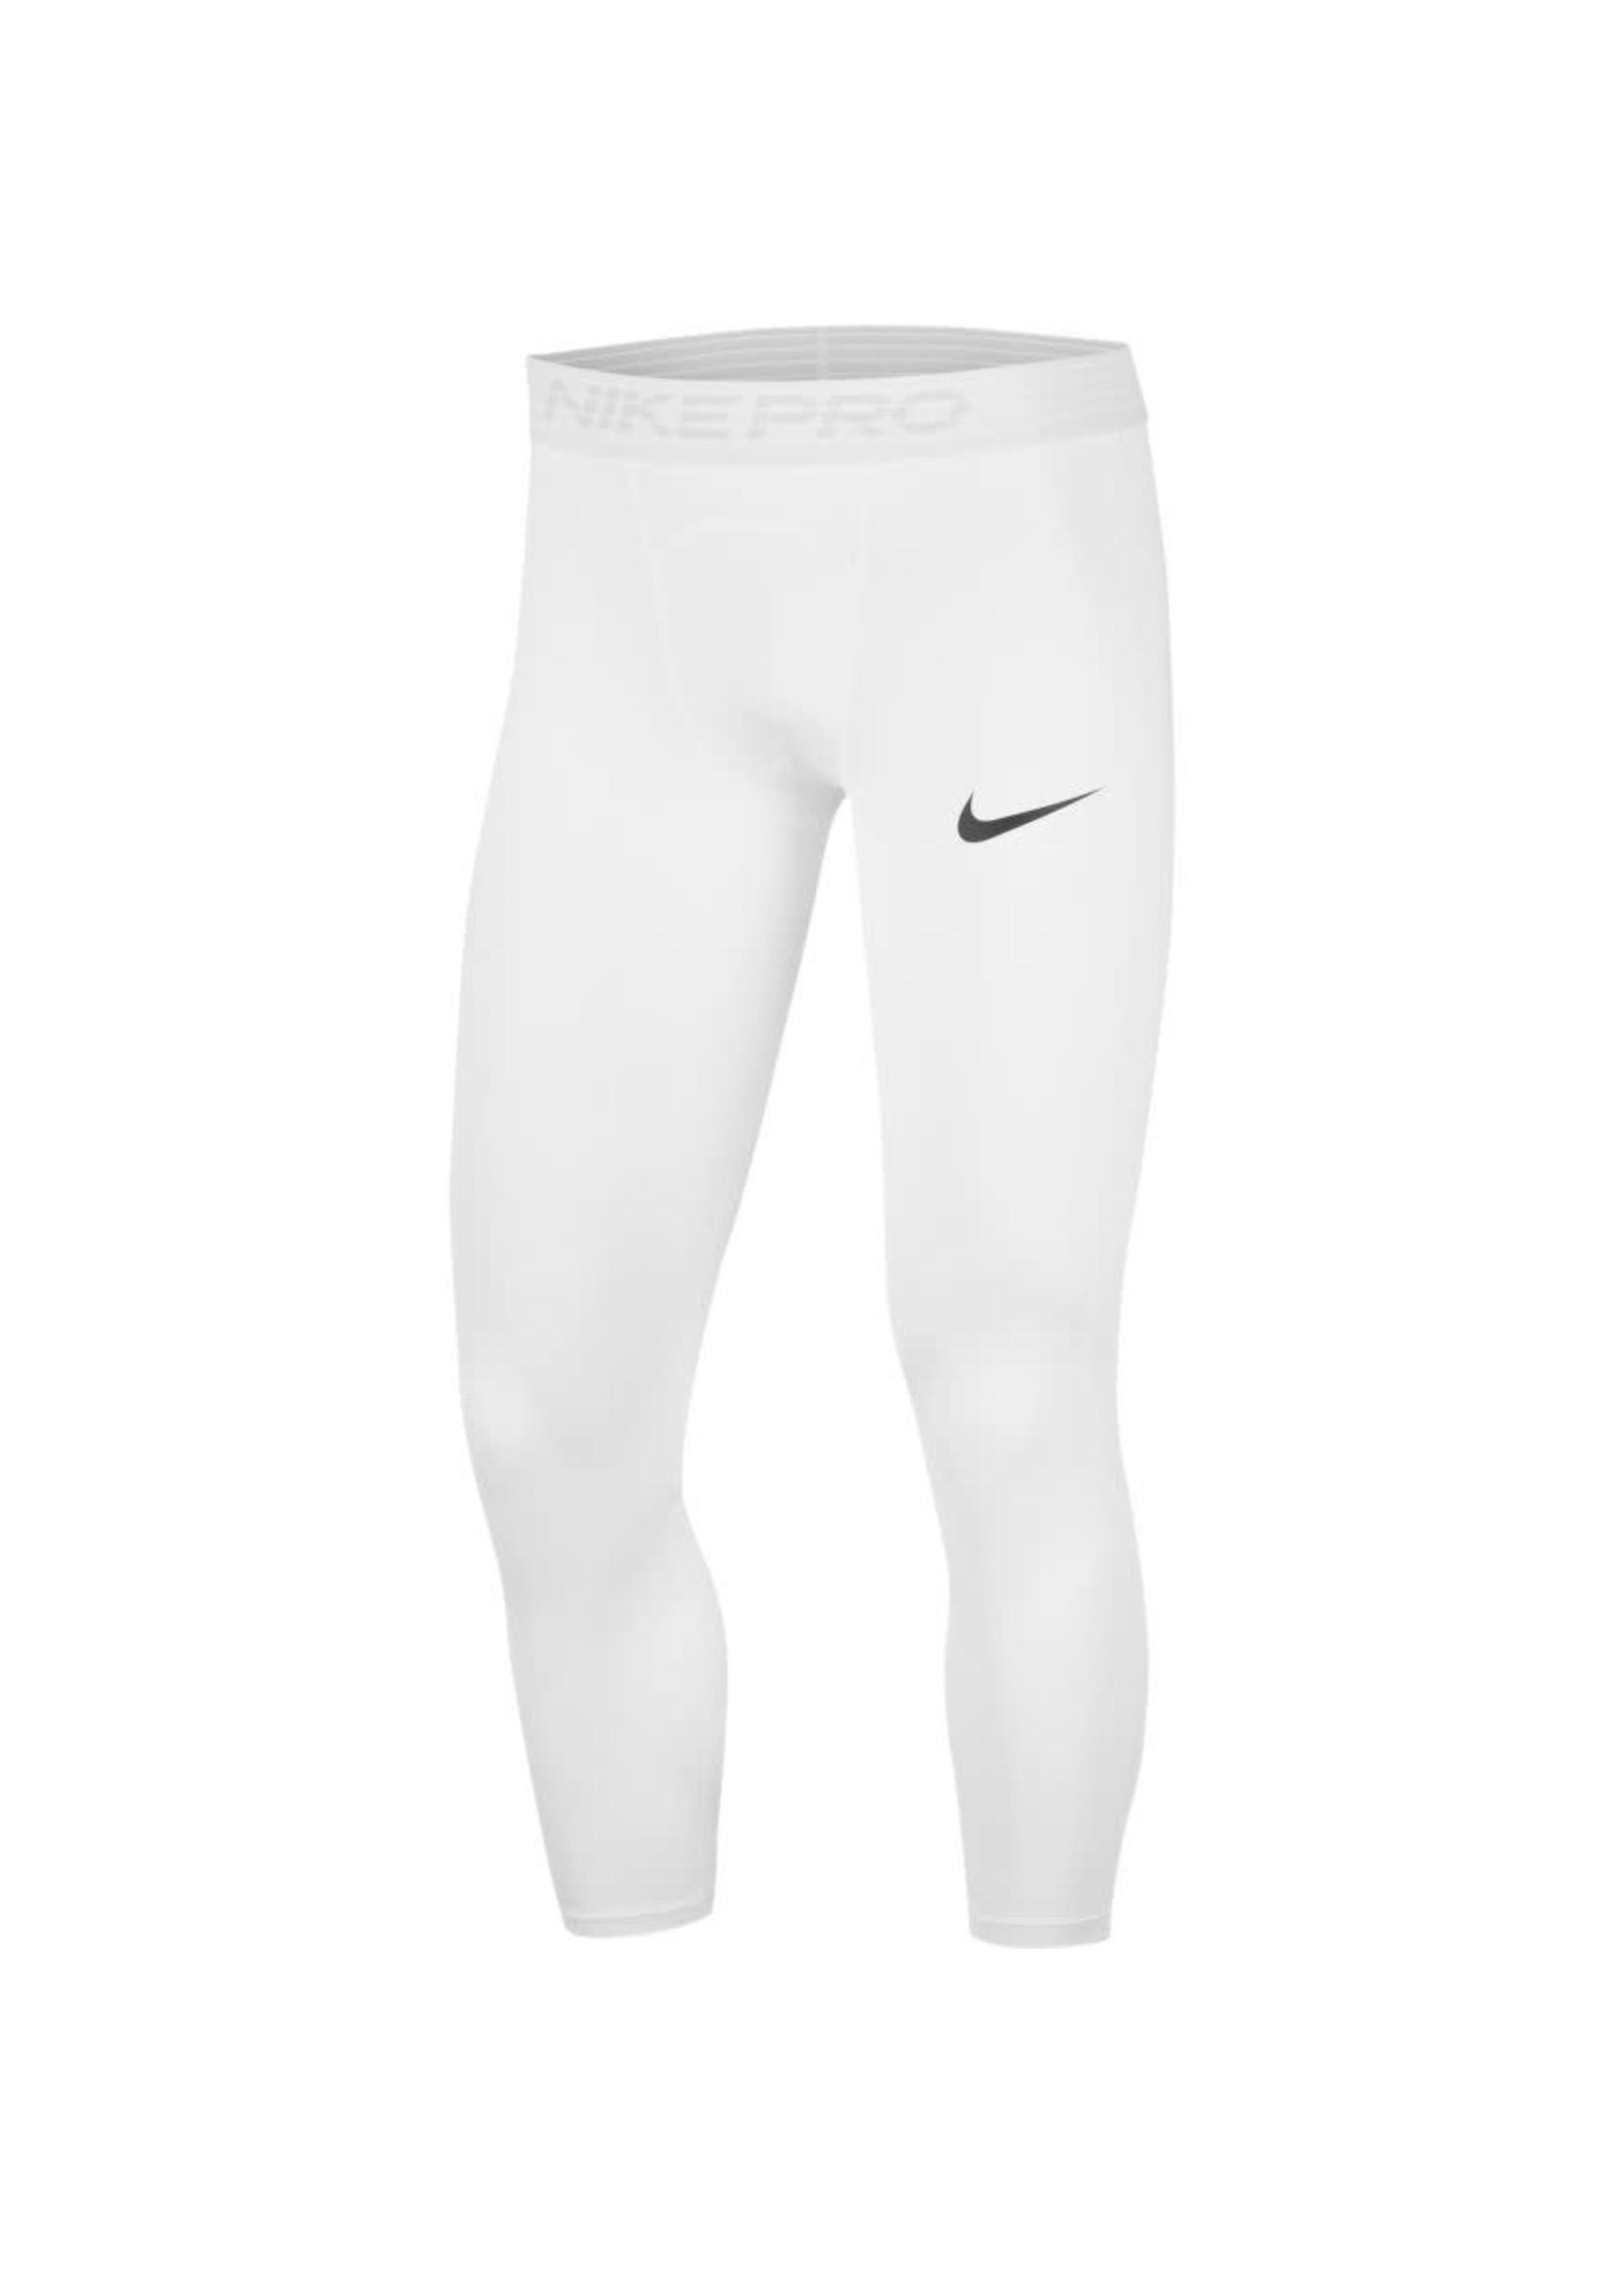 Nike Pro Tall 3/4 Compression Tights